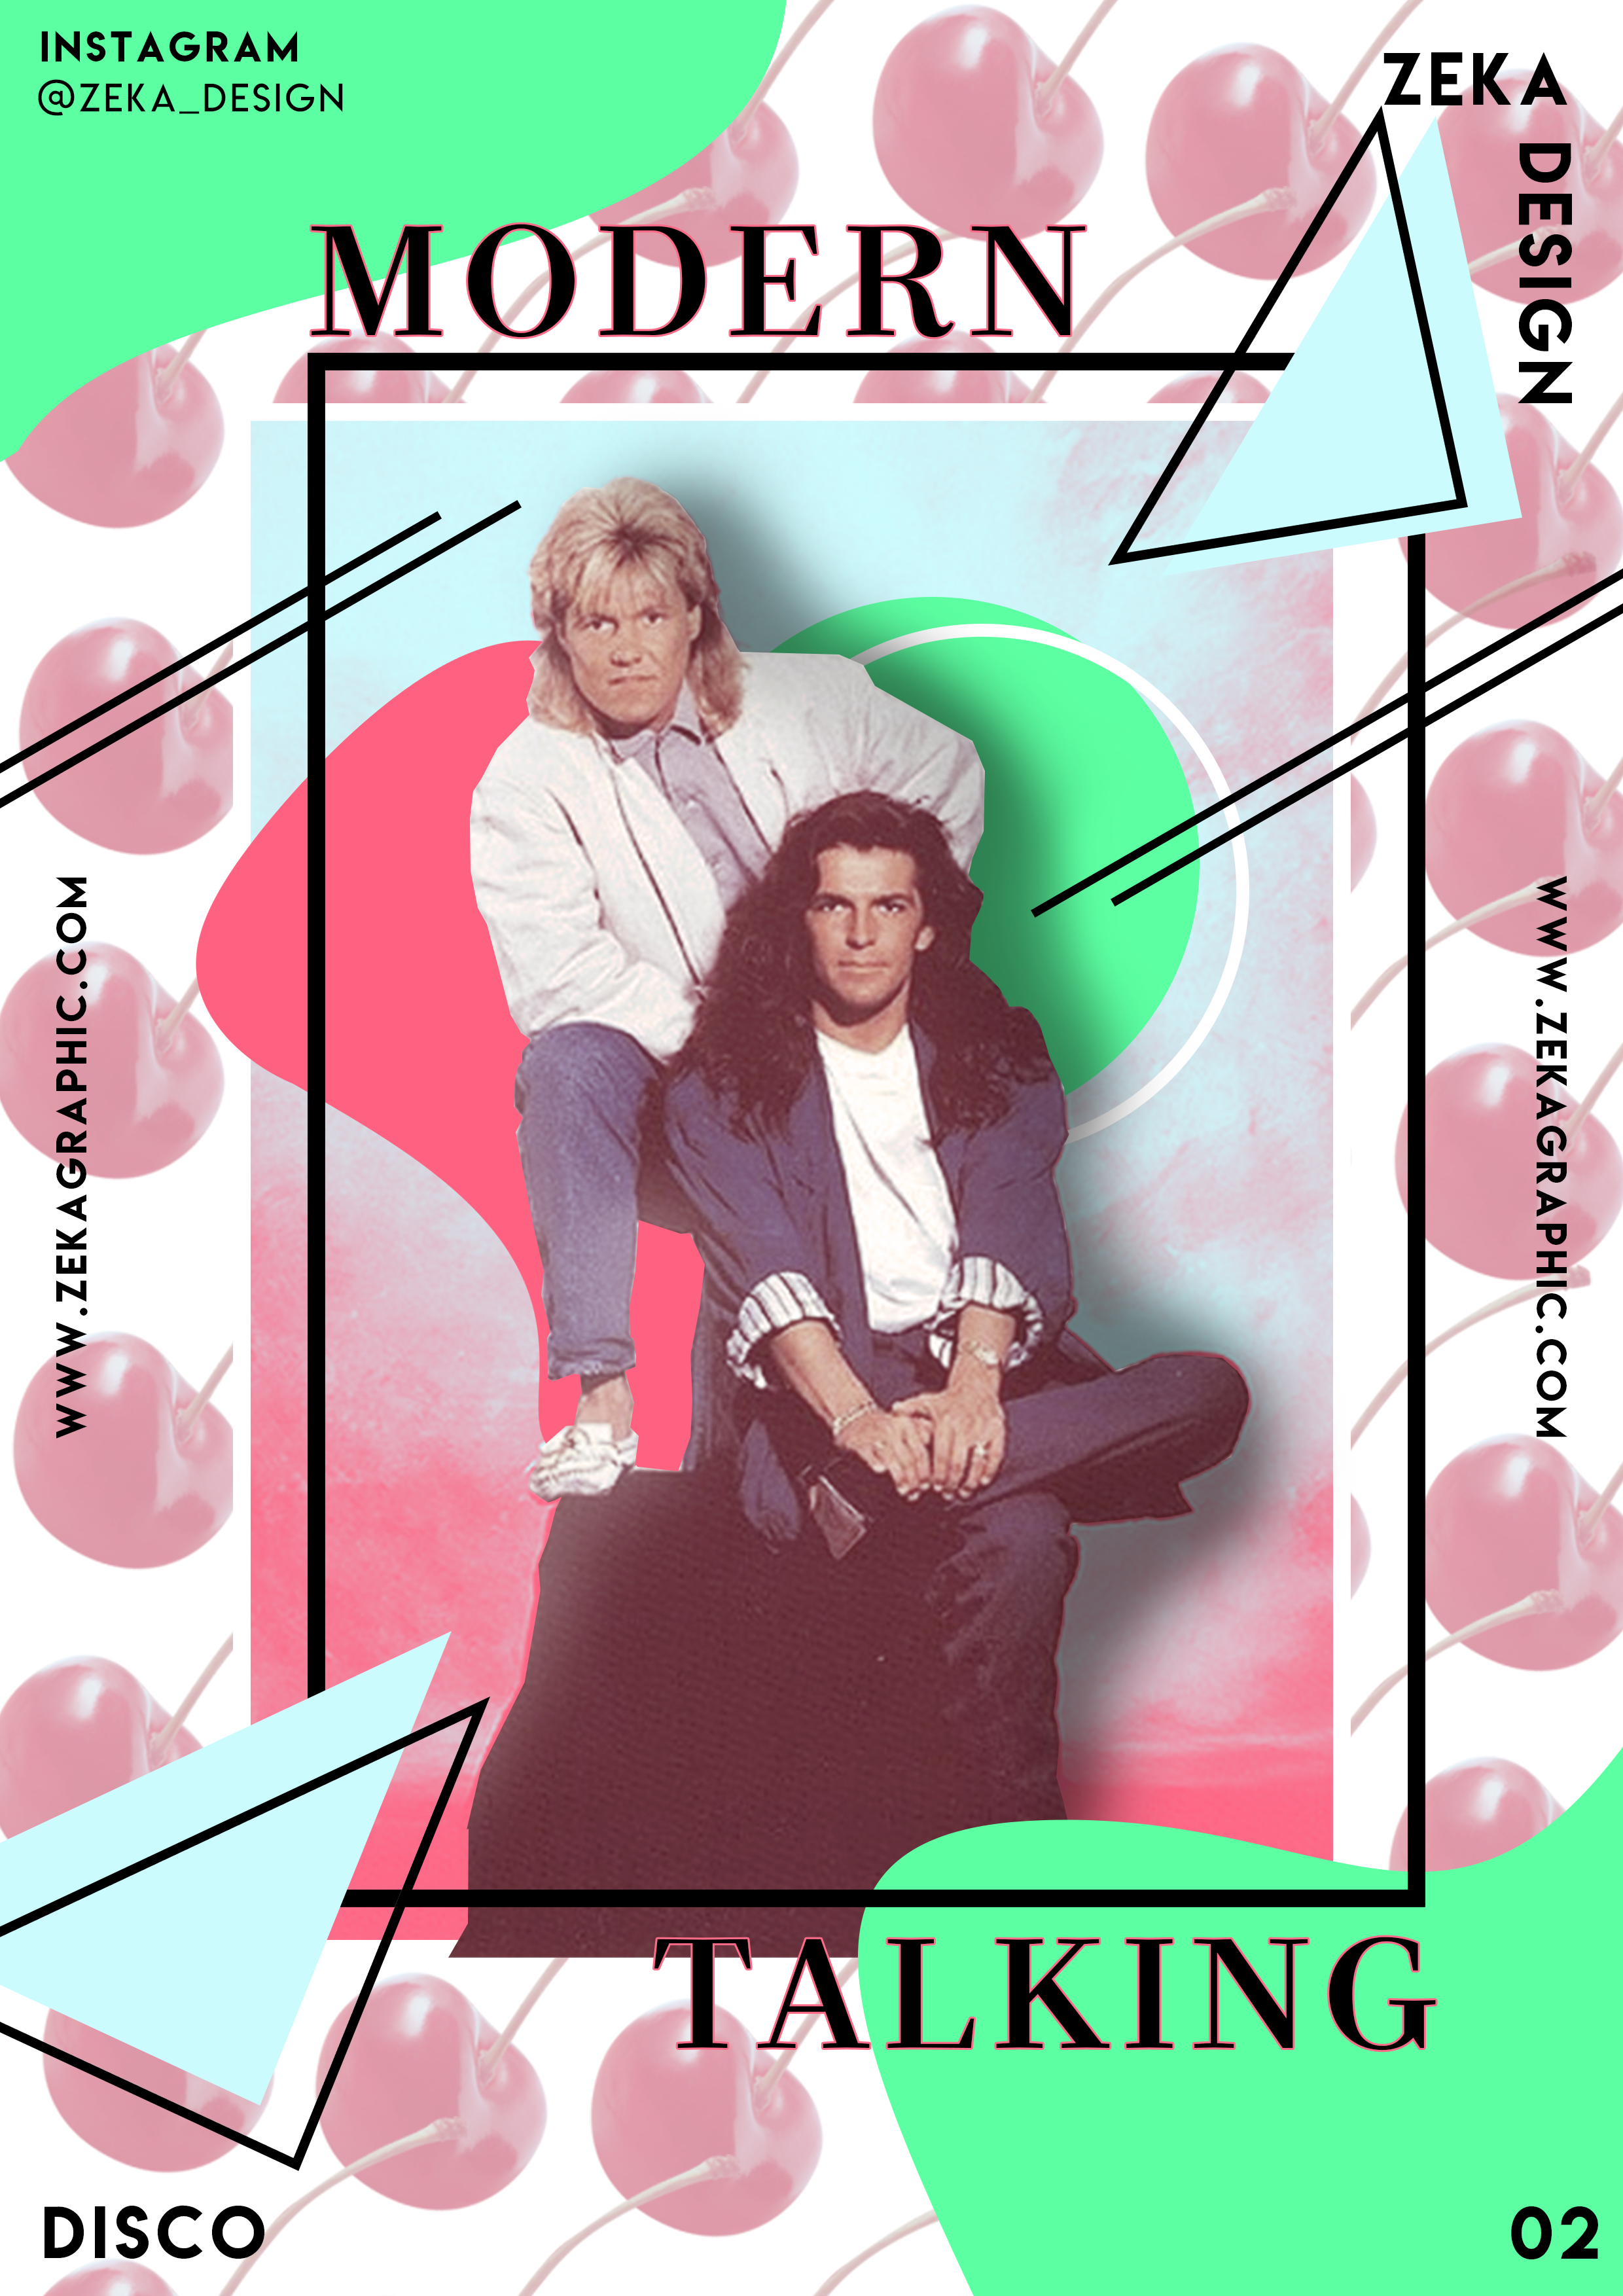 Disco Modern Talking Poster Design Poster Design Layout